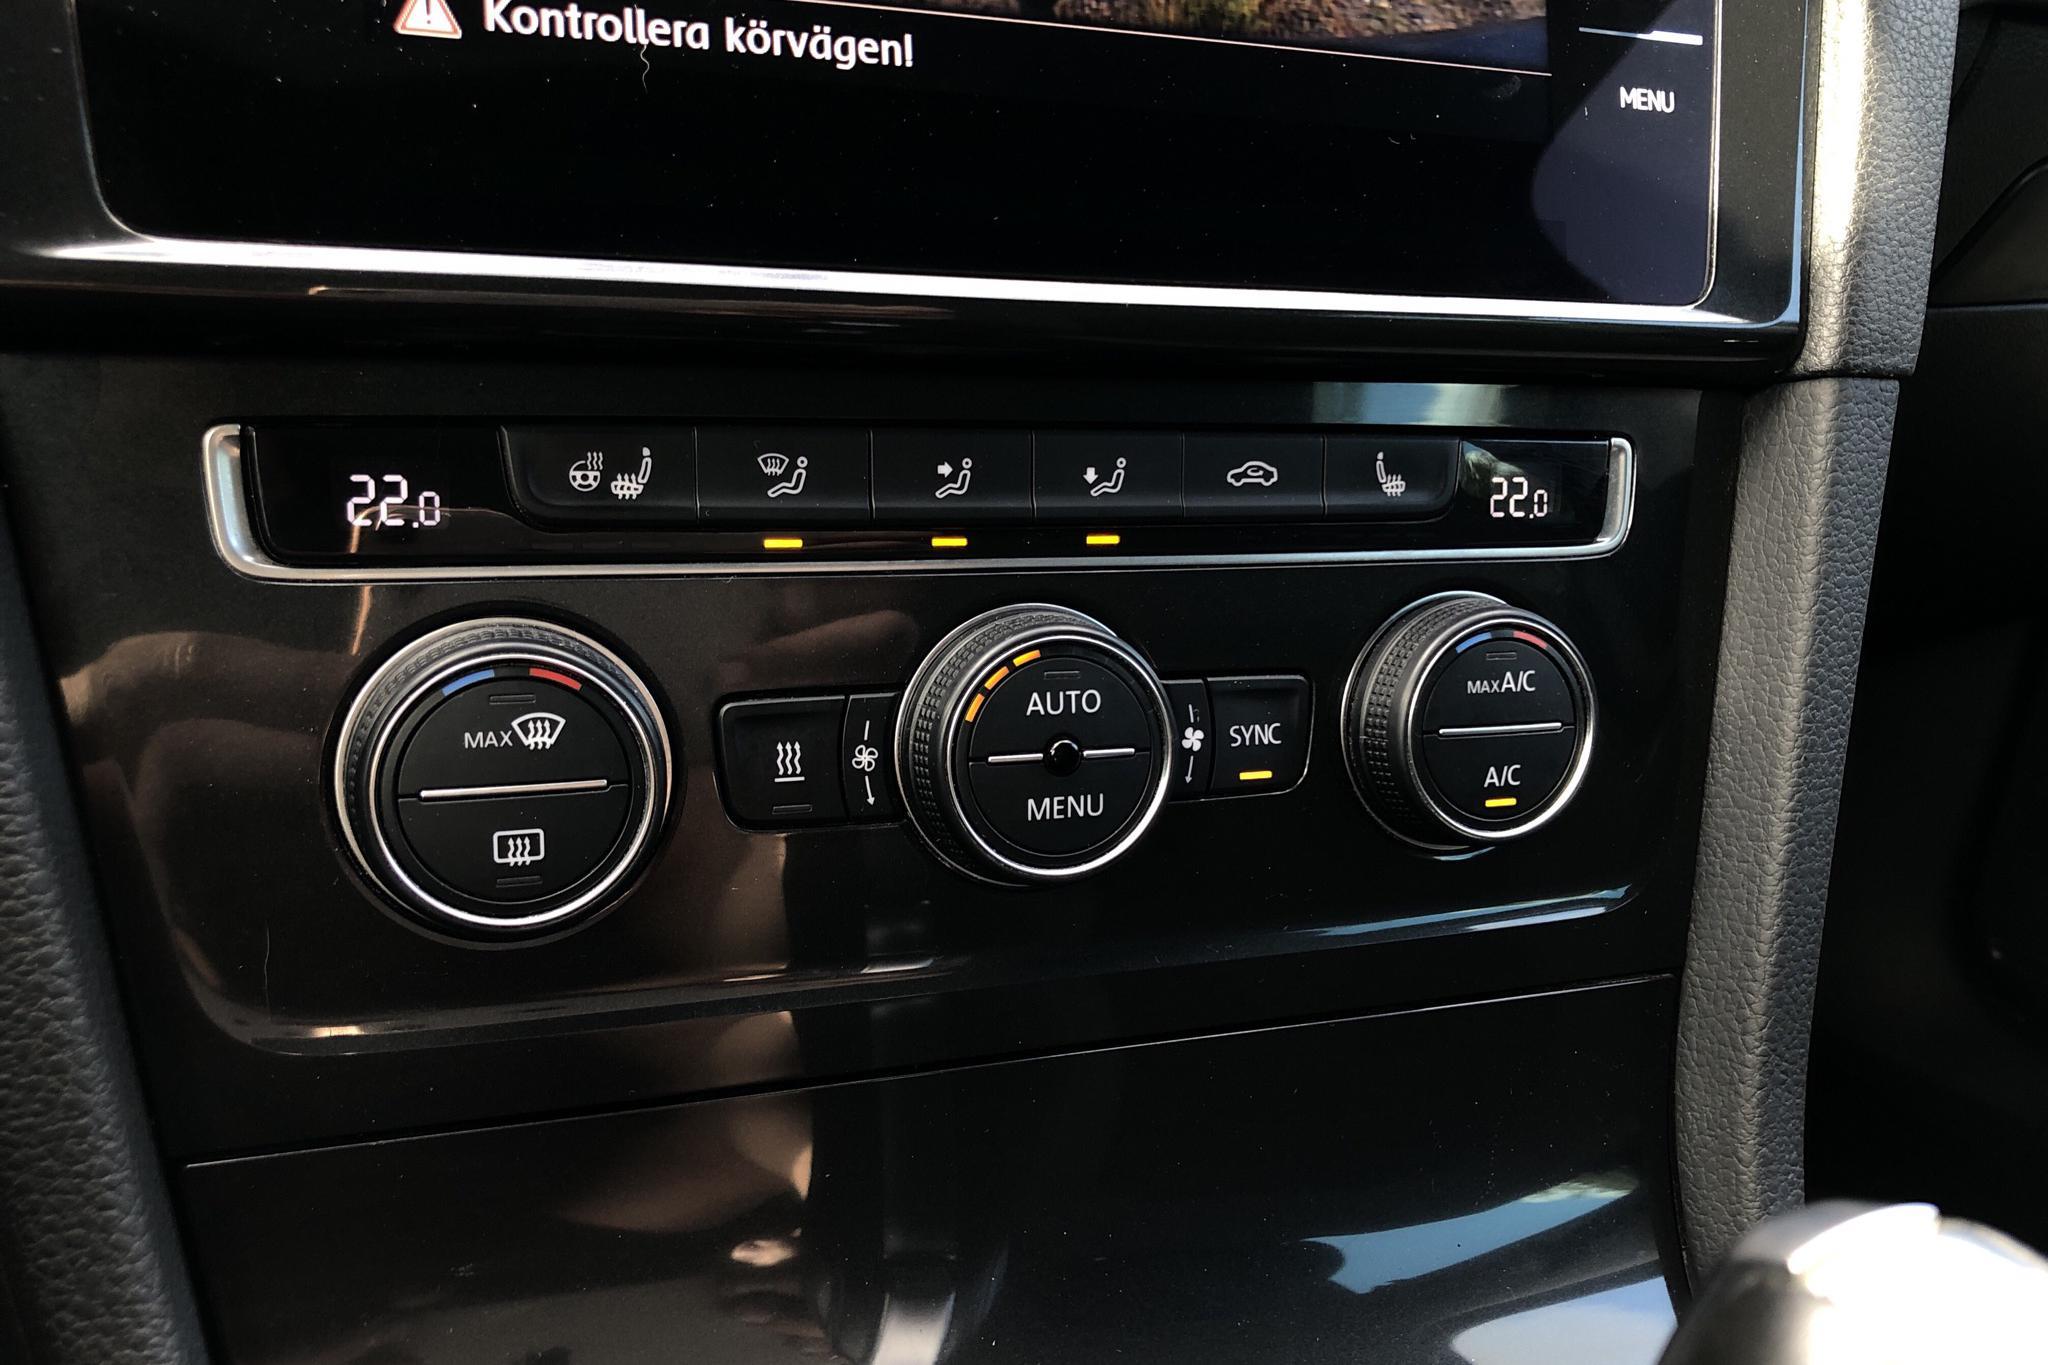 VW Golf Alltrack 2.0 TDI Sportscombi 4Motion (184hk) - 16 973 mil - Automat - Dark Grey - 2018